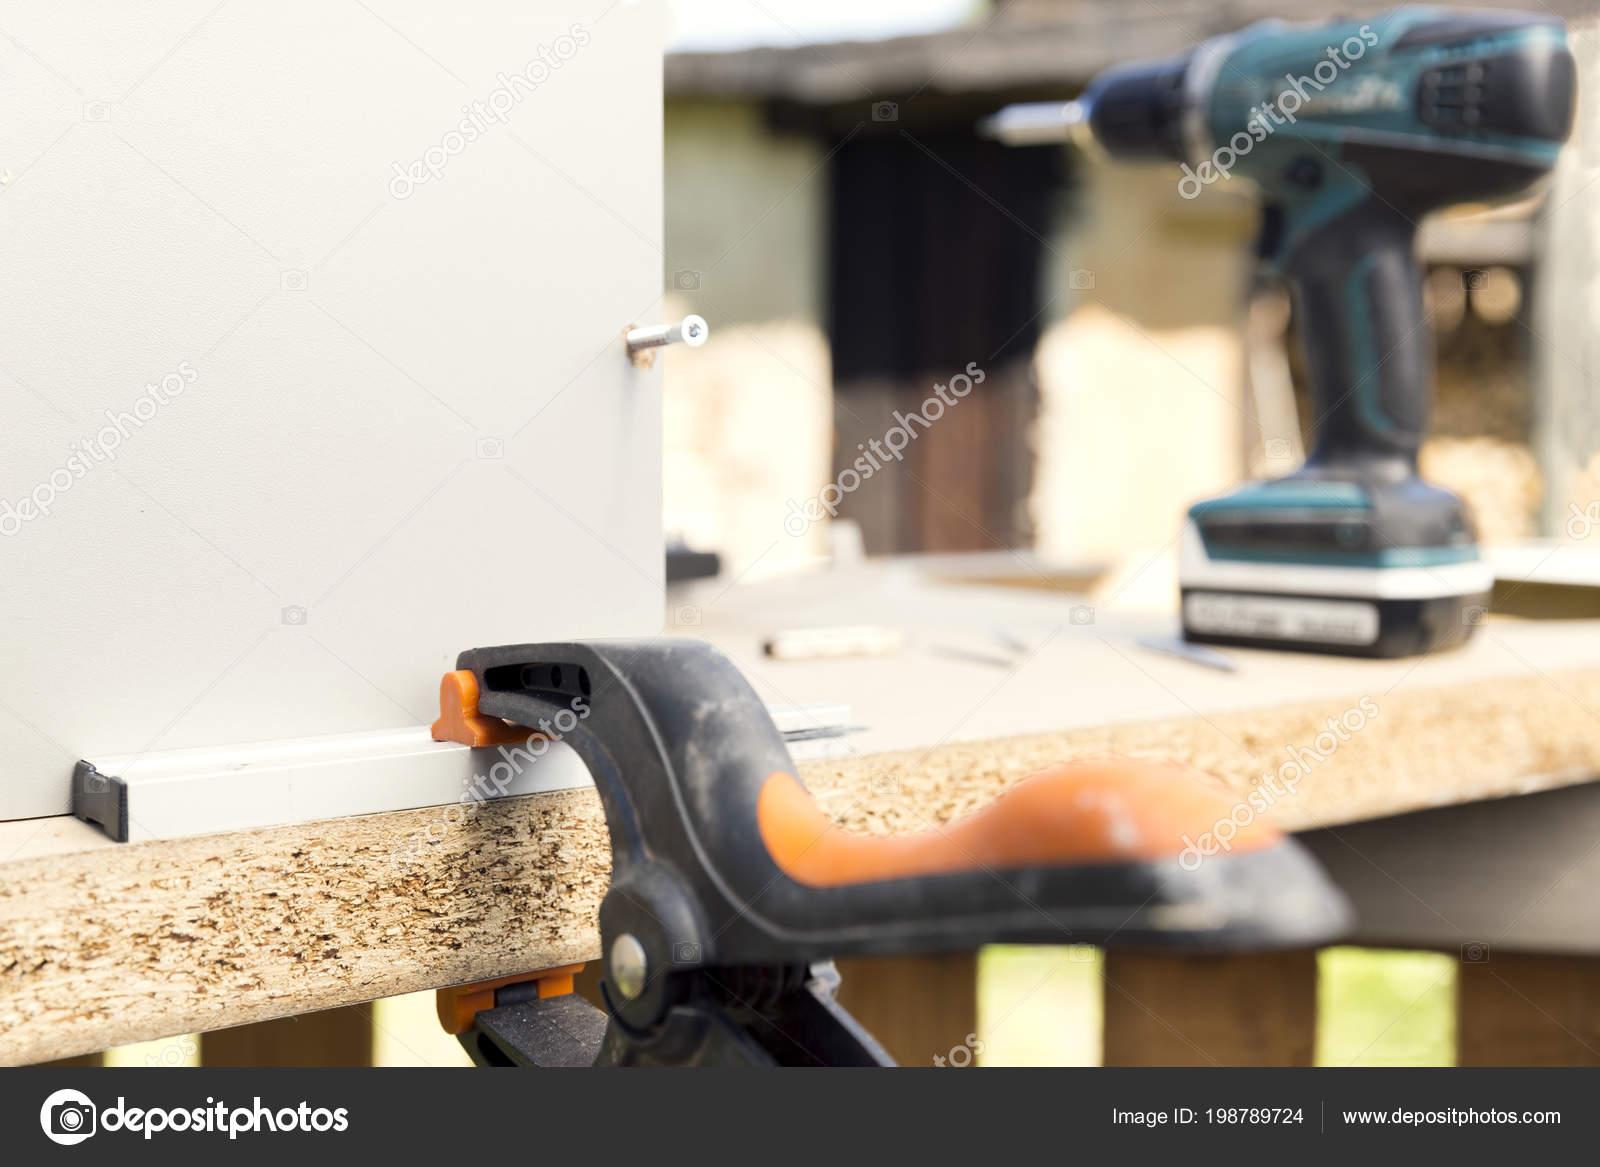 Furniture Assembly Making Kitchen Cabinet Using Screwdriver